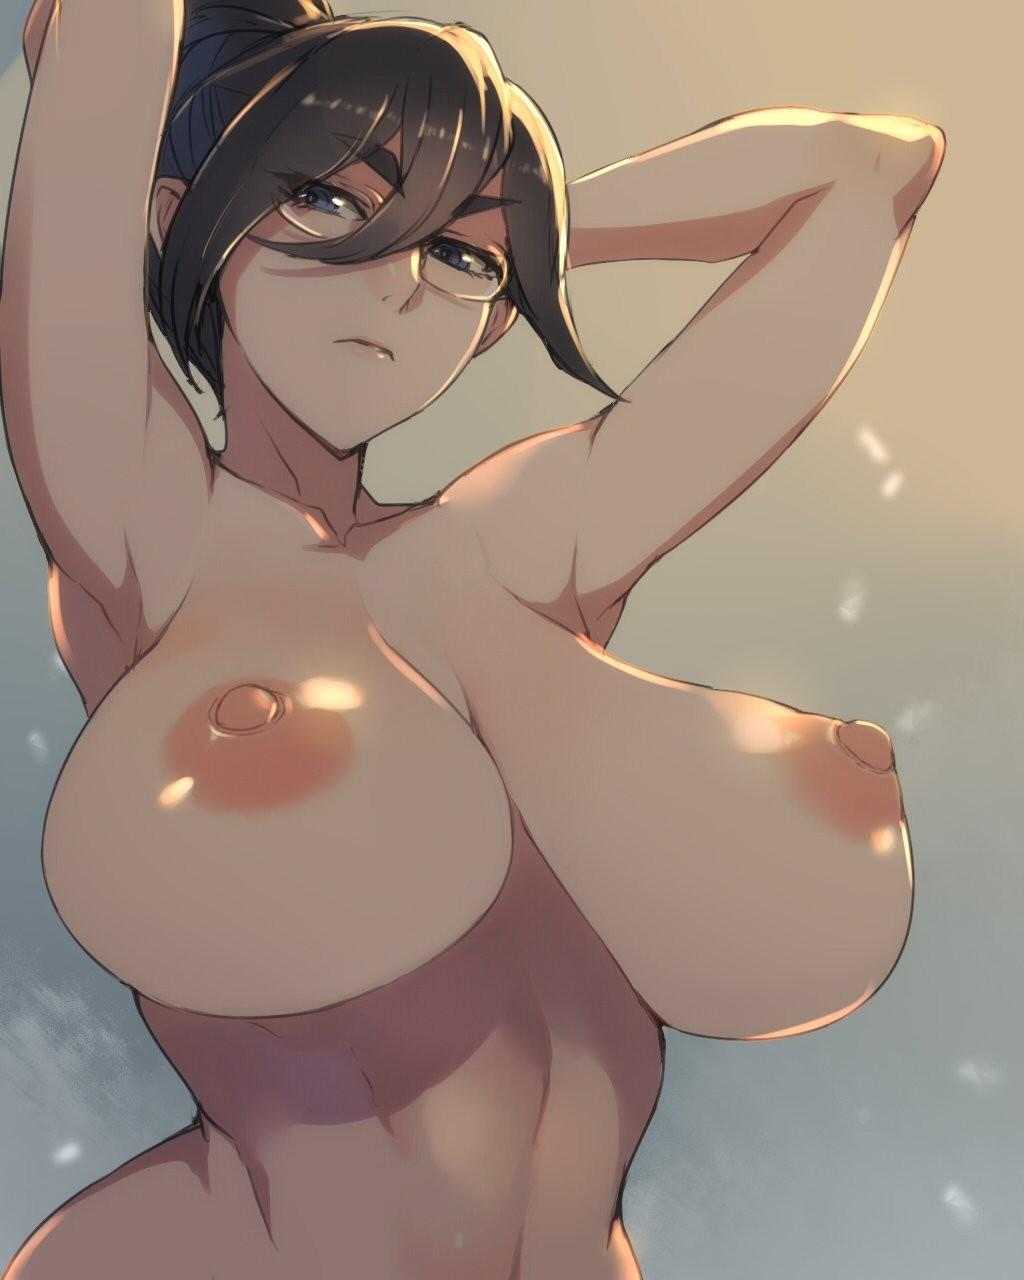 tits Anime girl